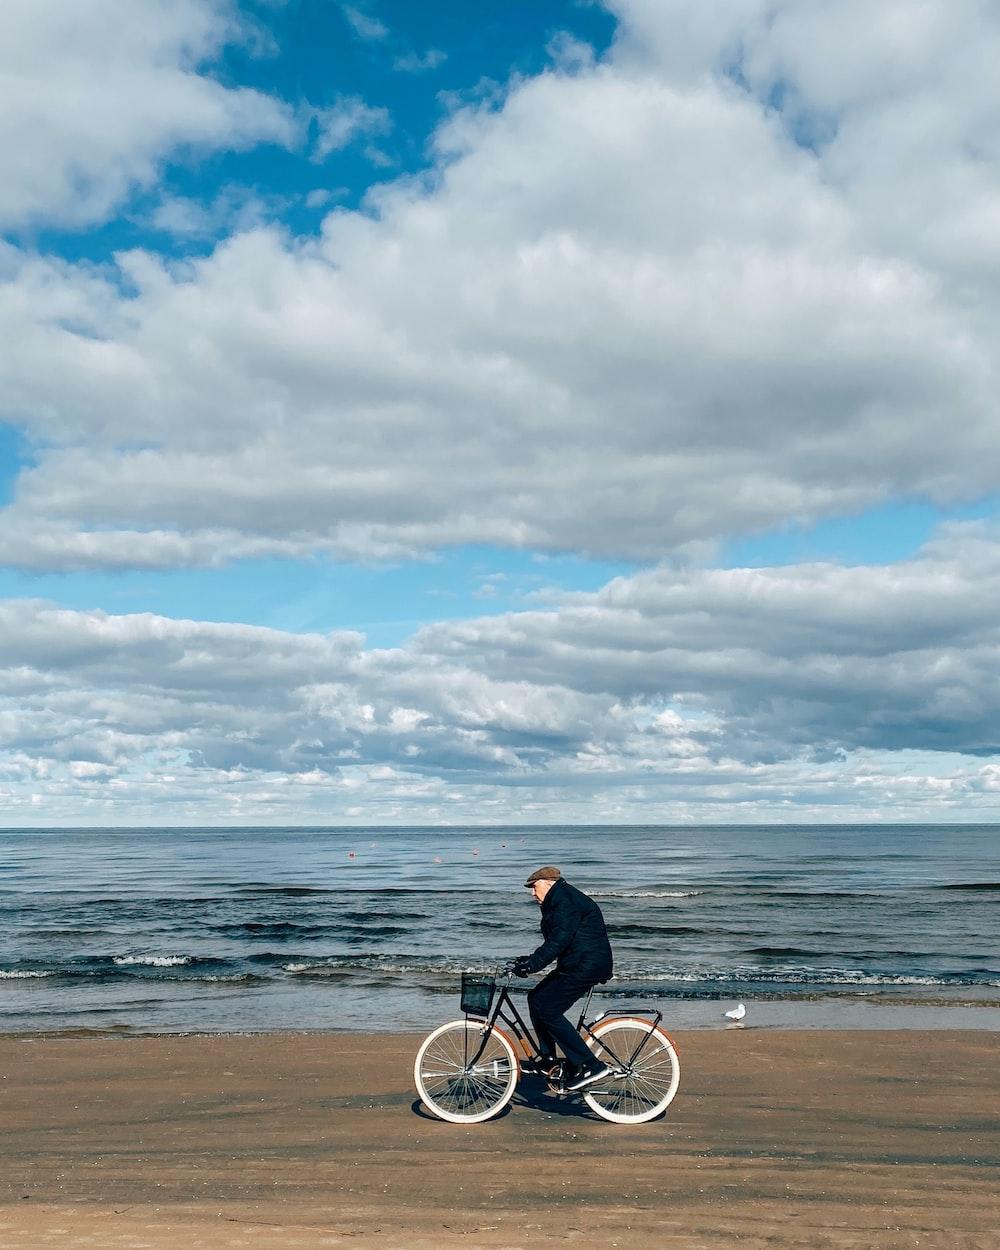 man in black jacket riding bicycle on beach during daytime